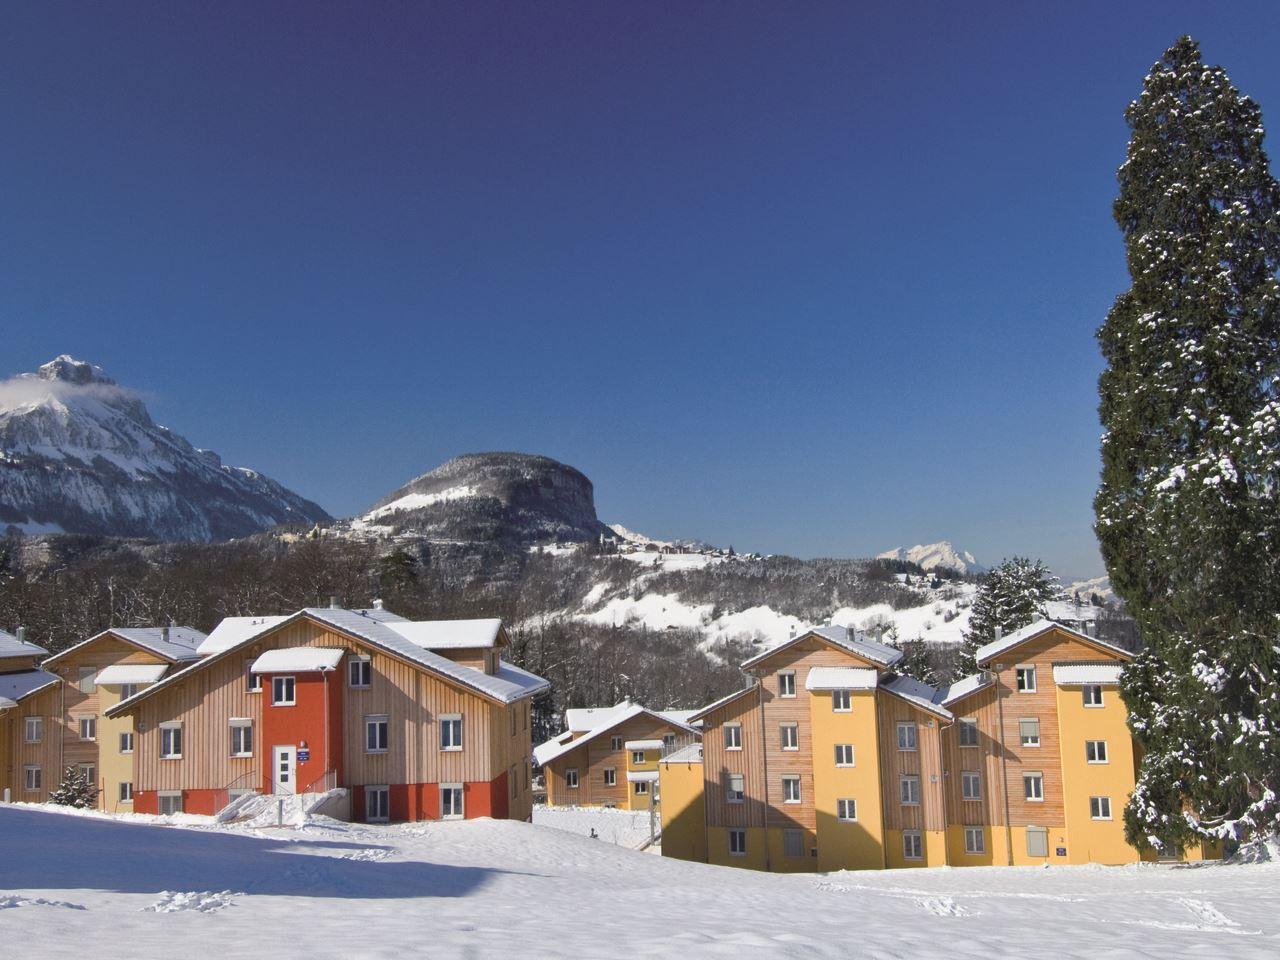 Appartement de vacances 4-Personen-Ferienwohnung im Ferienpark Landal Vierwaldstättersee - in den Bergen (355277), Morschach, Lac des Quatre-Cantons, Suisse Centrale, Suisse, image 2